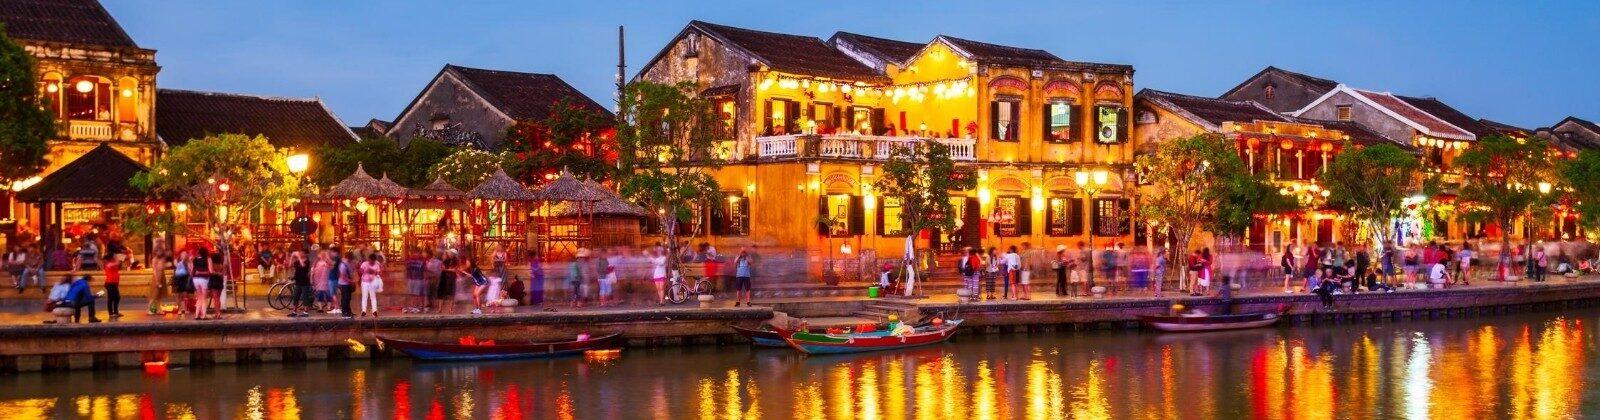 hoi an vietnam at night